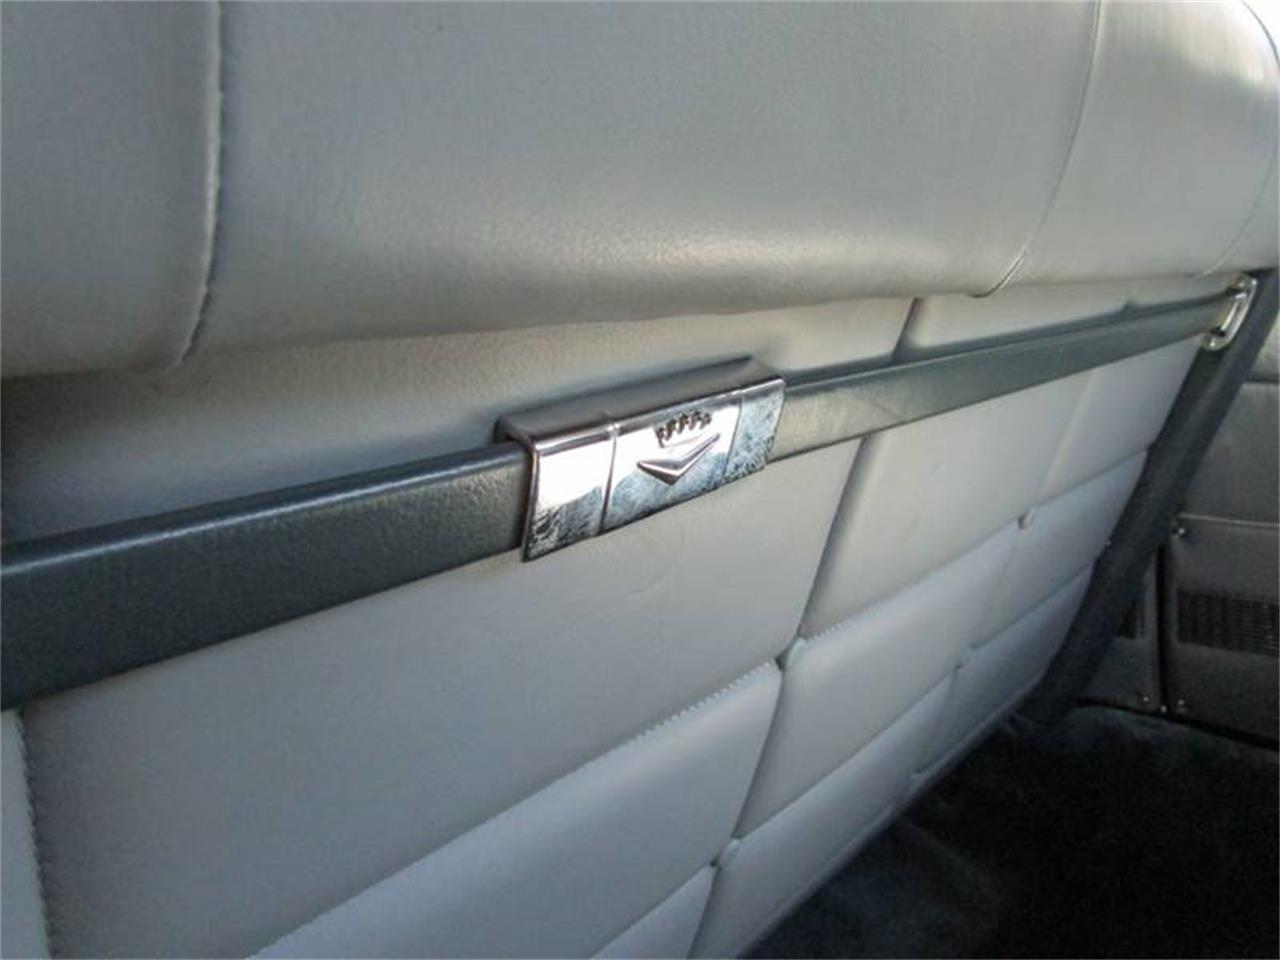 Large Picture of Classic '58 Cadillac Eldorado located in Wisconsin - $199,500.00 - QGHC